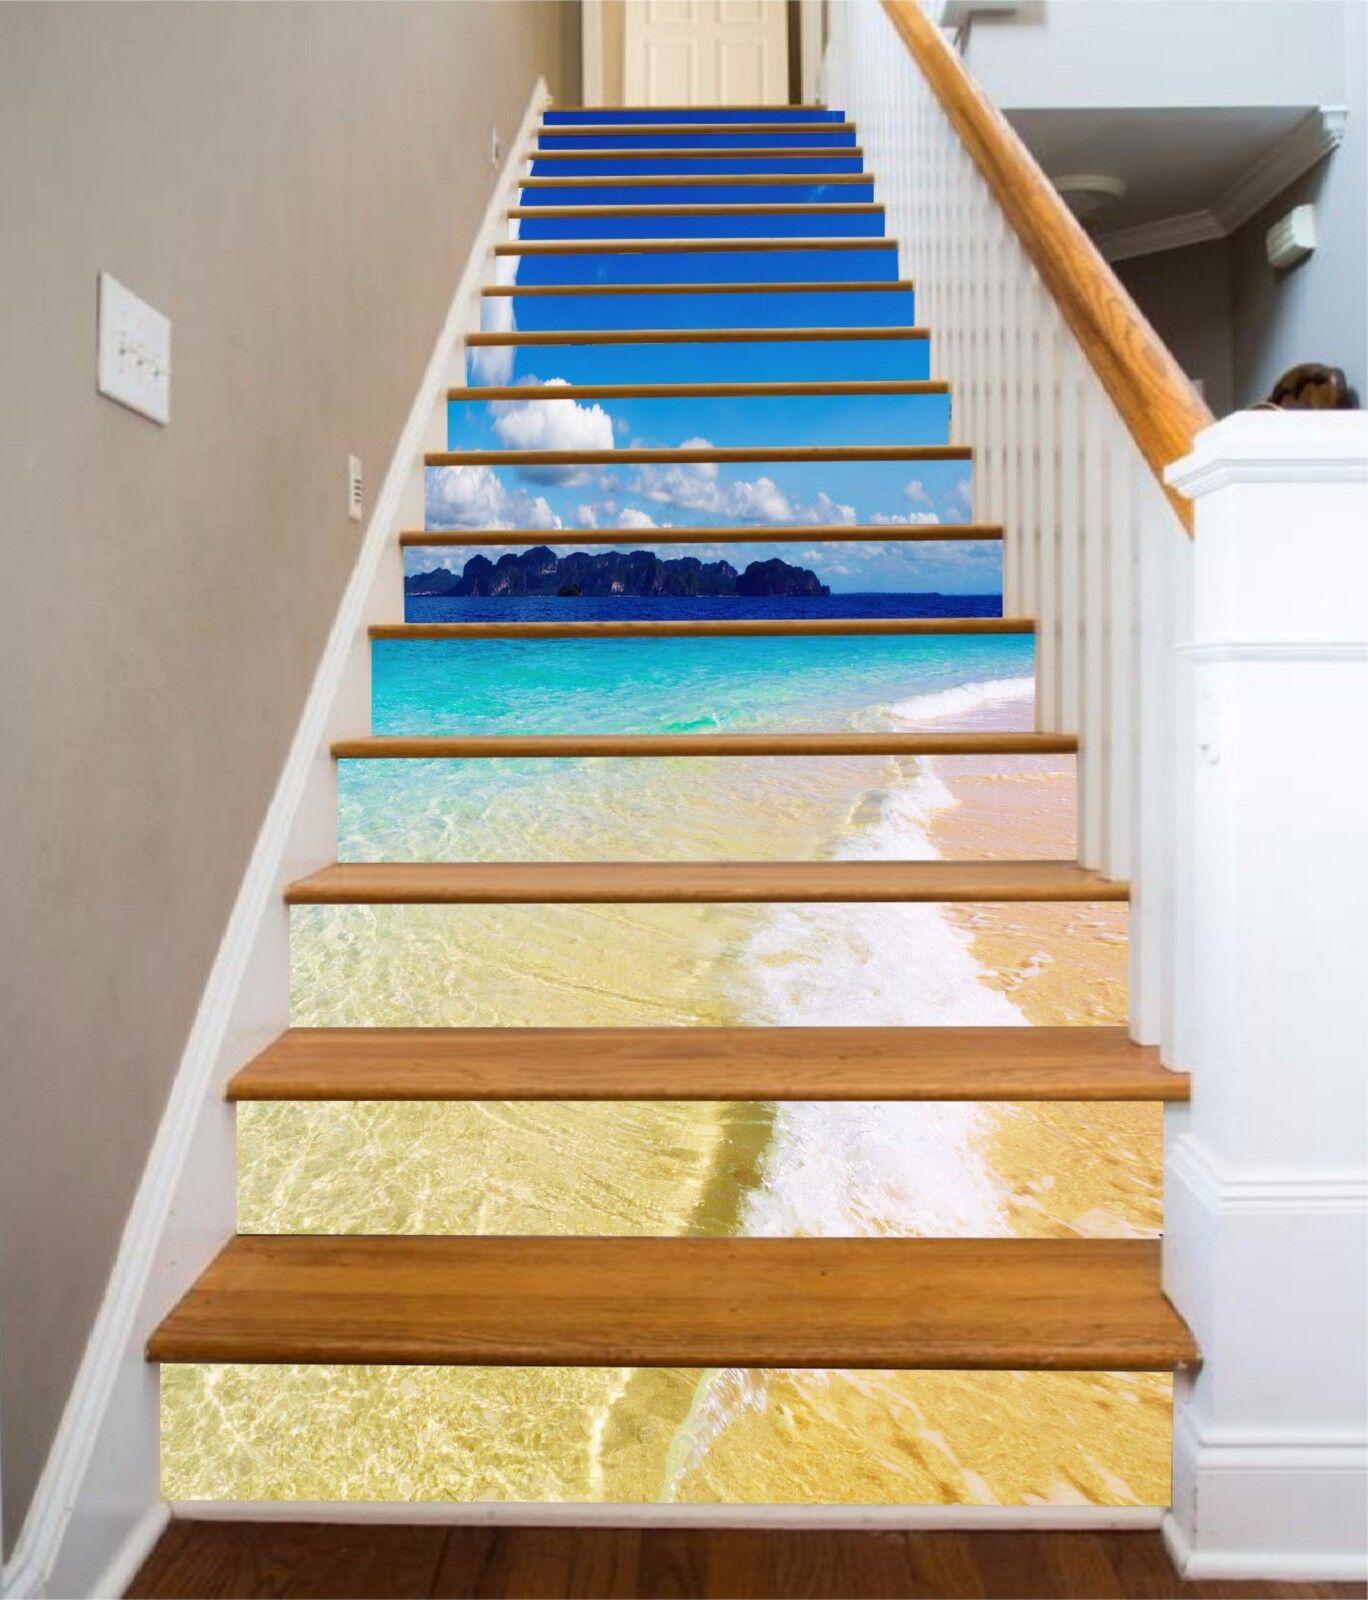 3D Beautiful Sea 21 Stair Risers Decoration Photo Mural Vinyl Decal Wallpaper UK